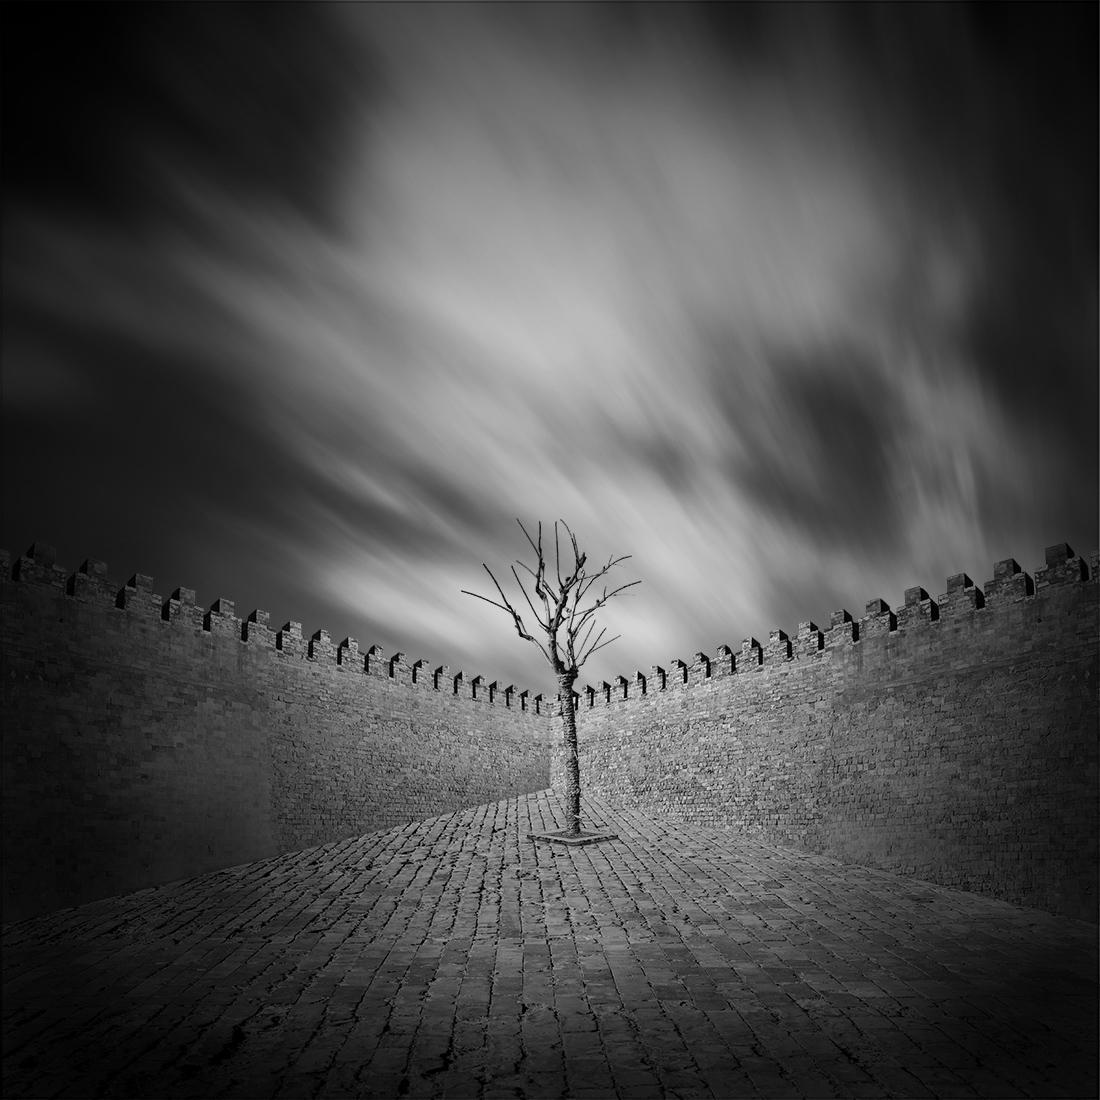 Tree of life by Hasibe Borhani (5).jpg